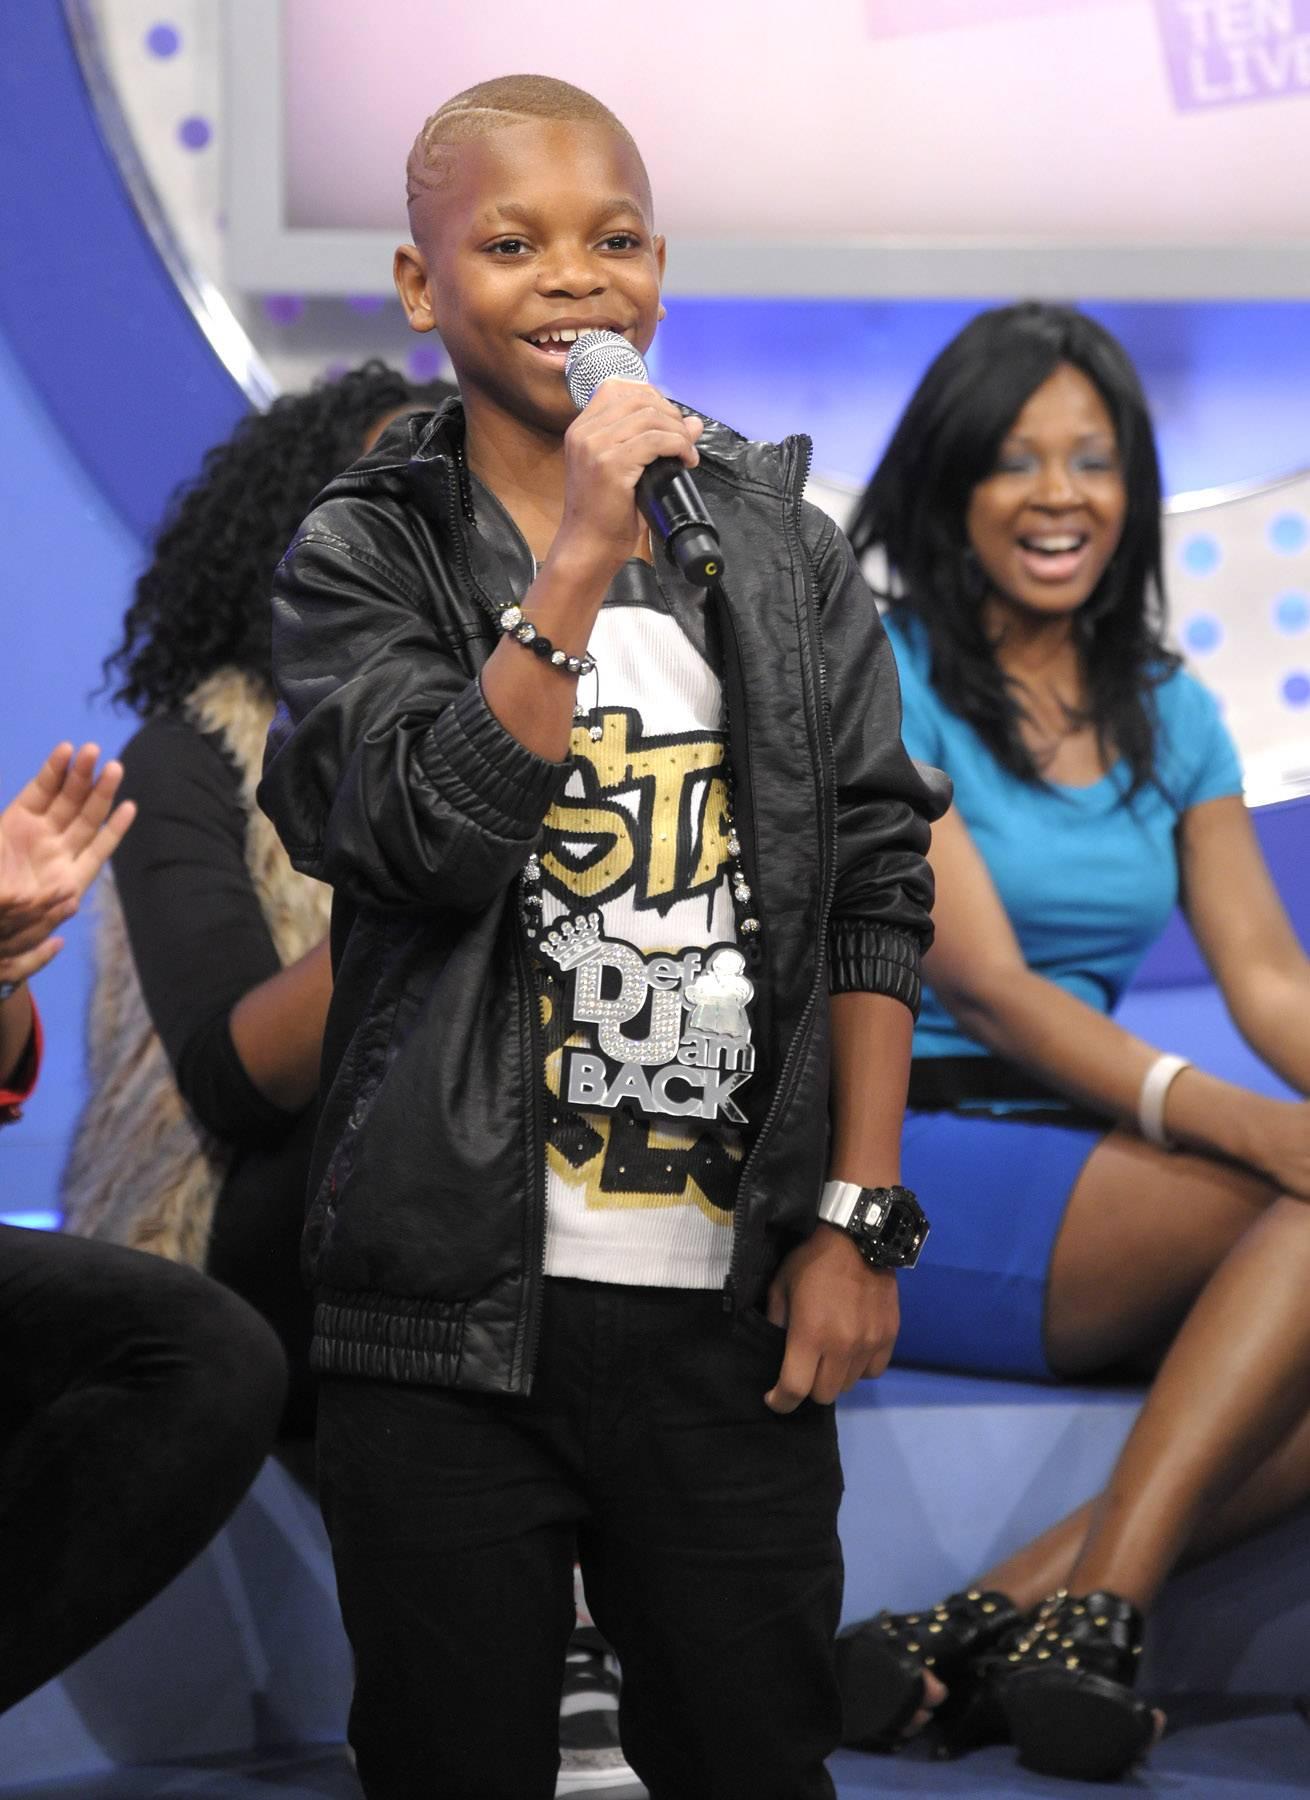 Niqo on the mic - Lil Niqo at 106 & Park, May 16, 2012. (Photo: John Ricard / BET)